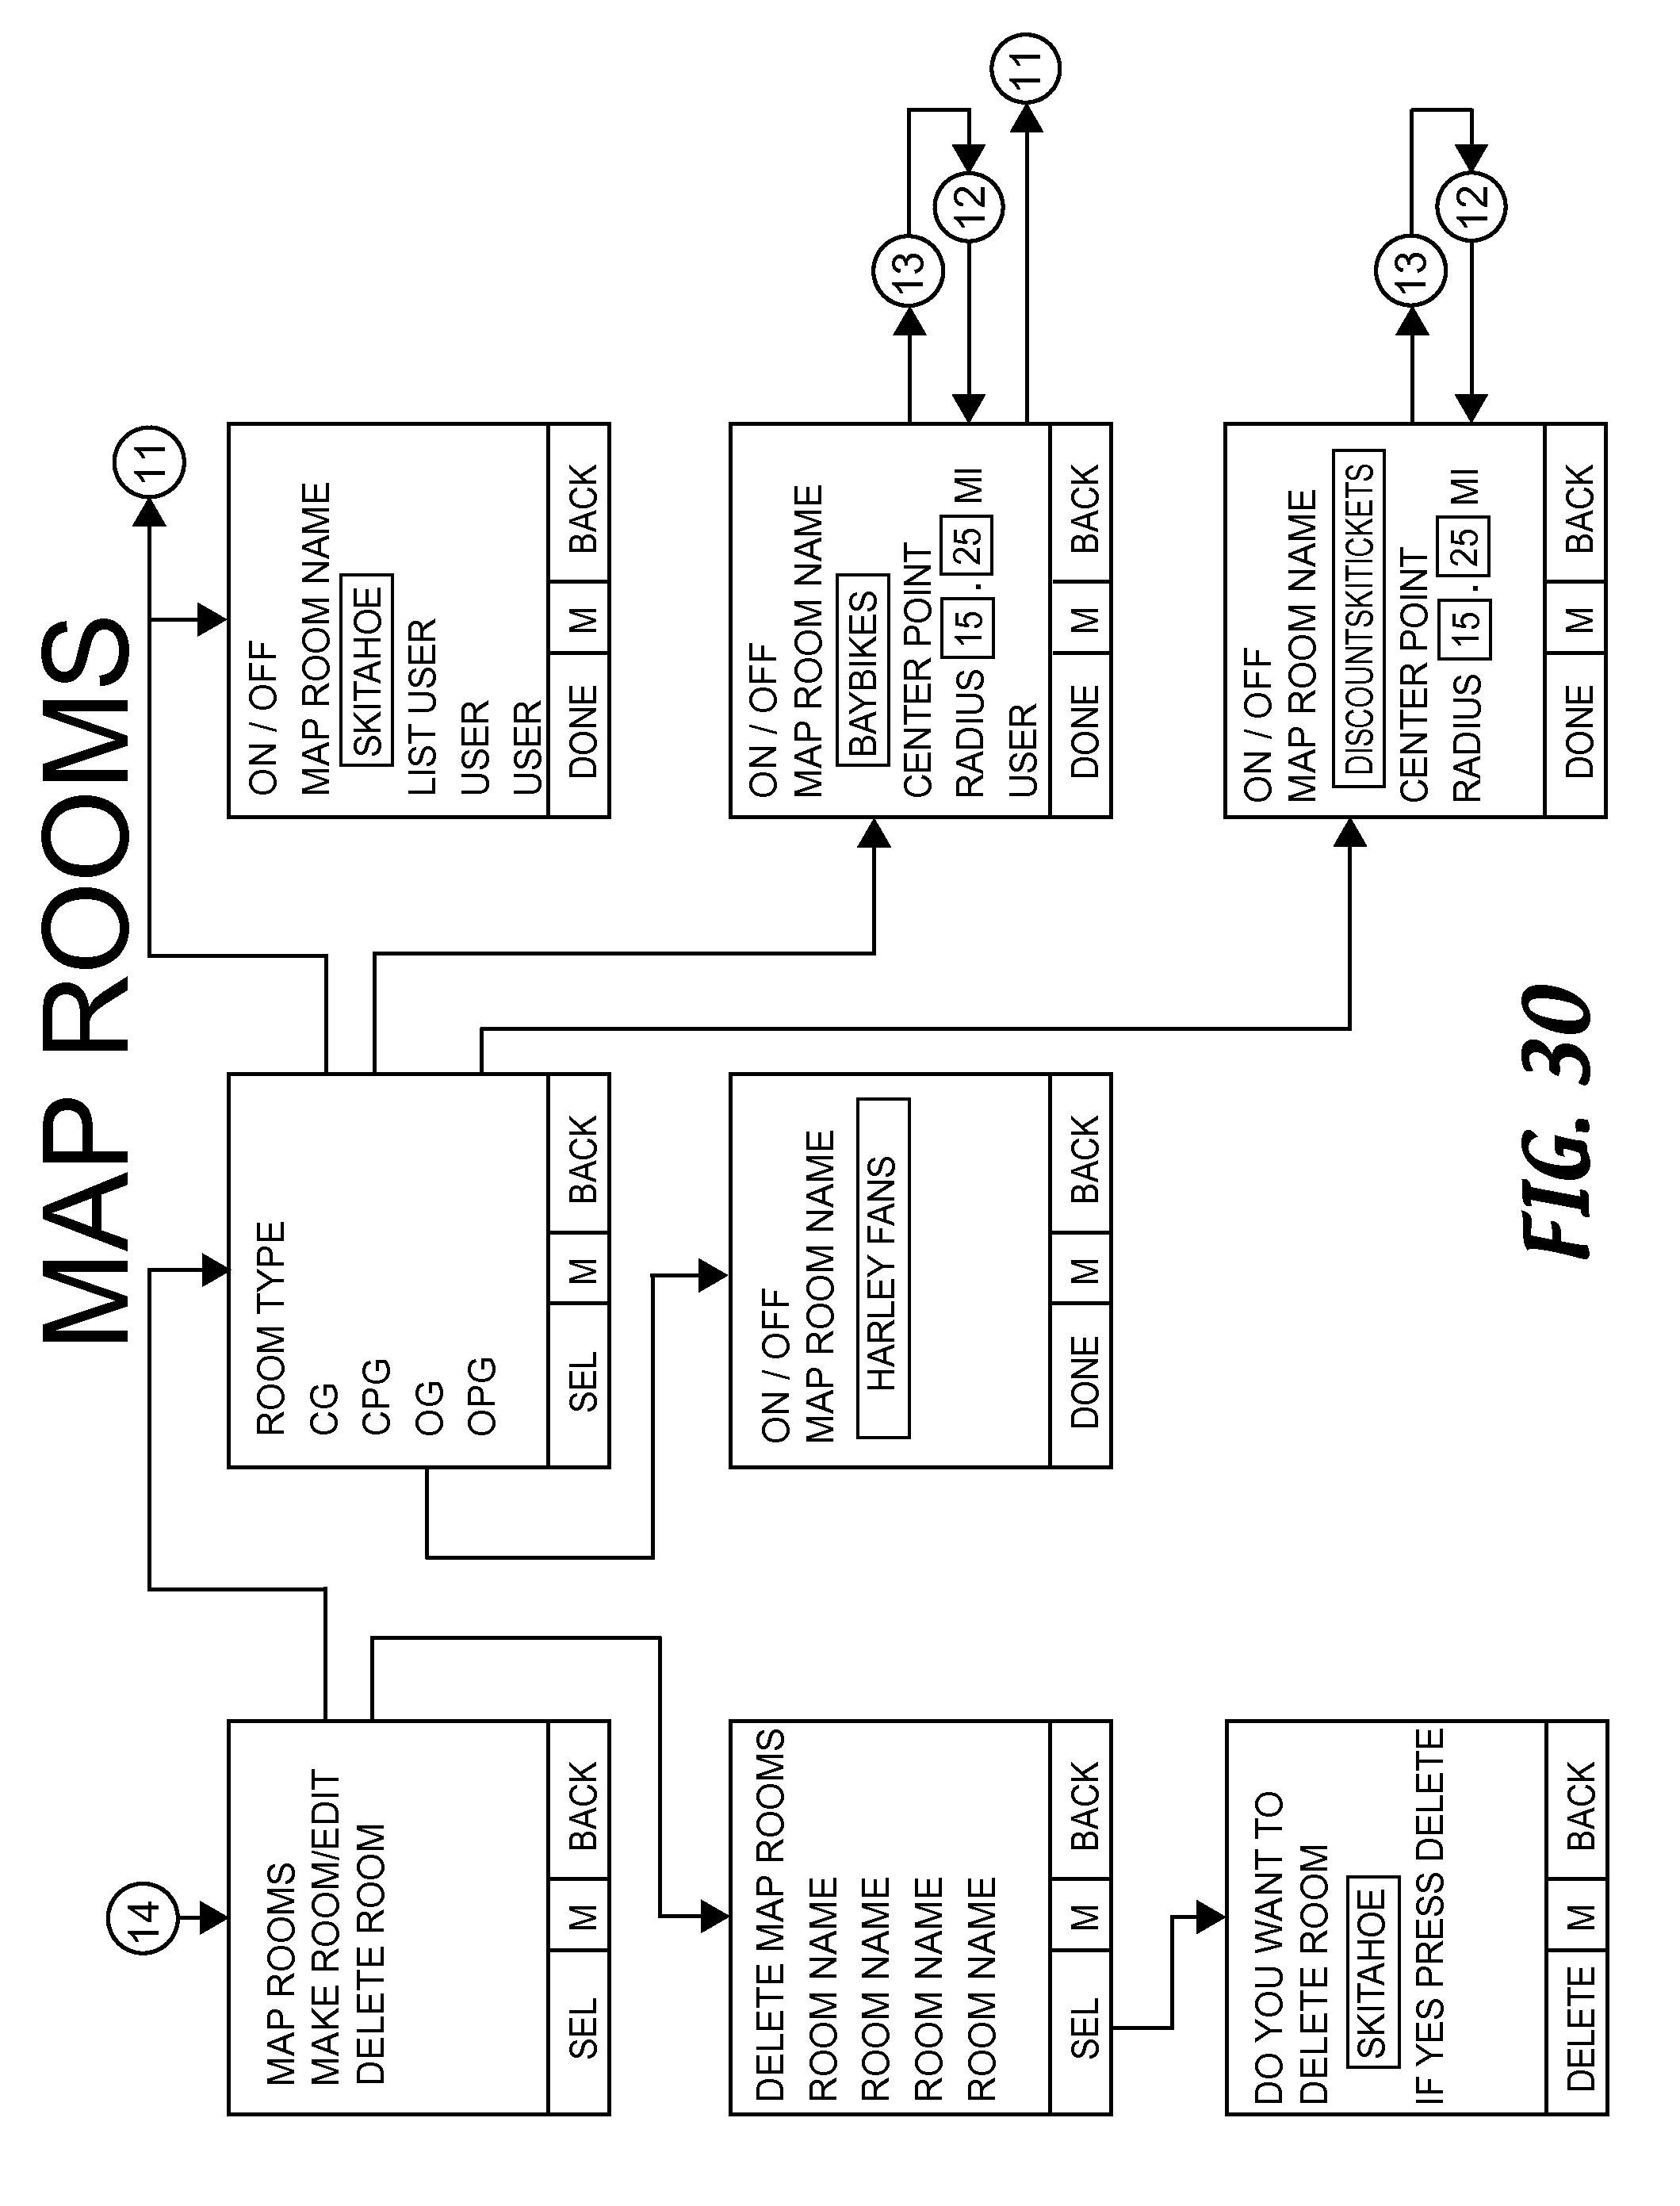 Patent US 9,167,558 B2